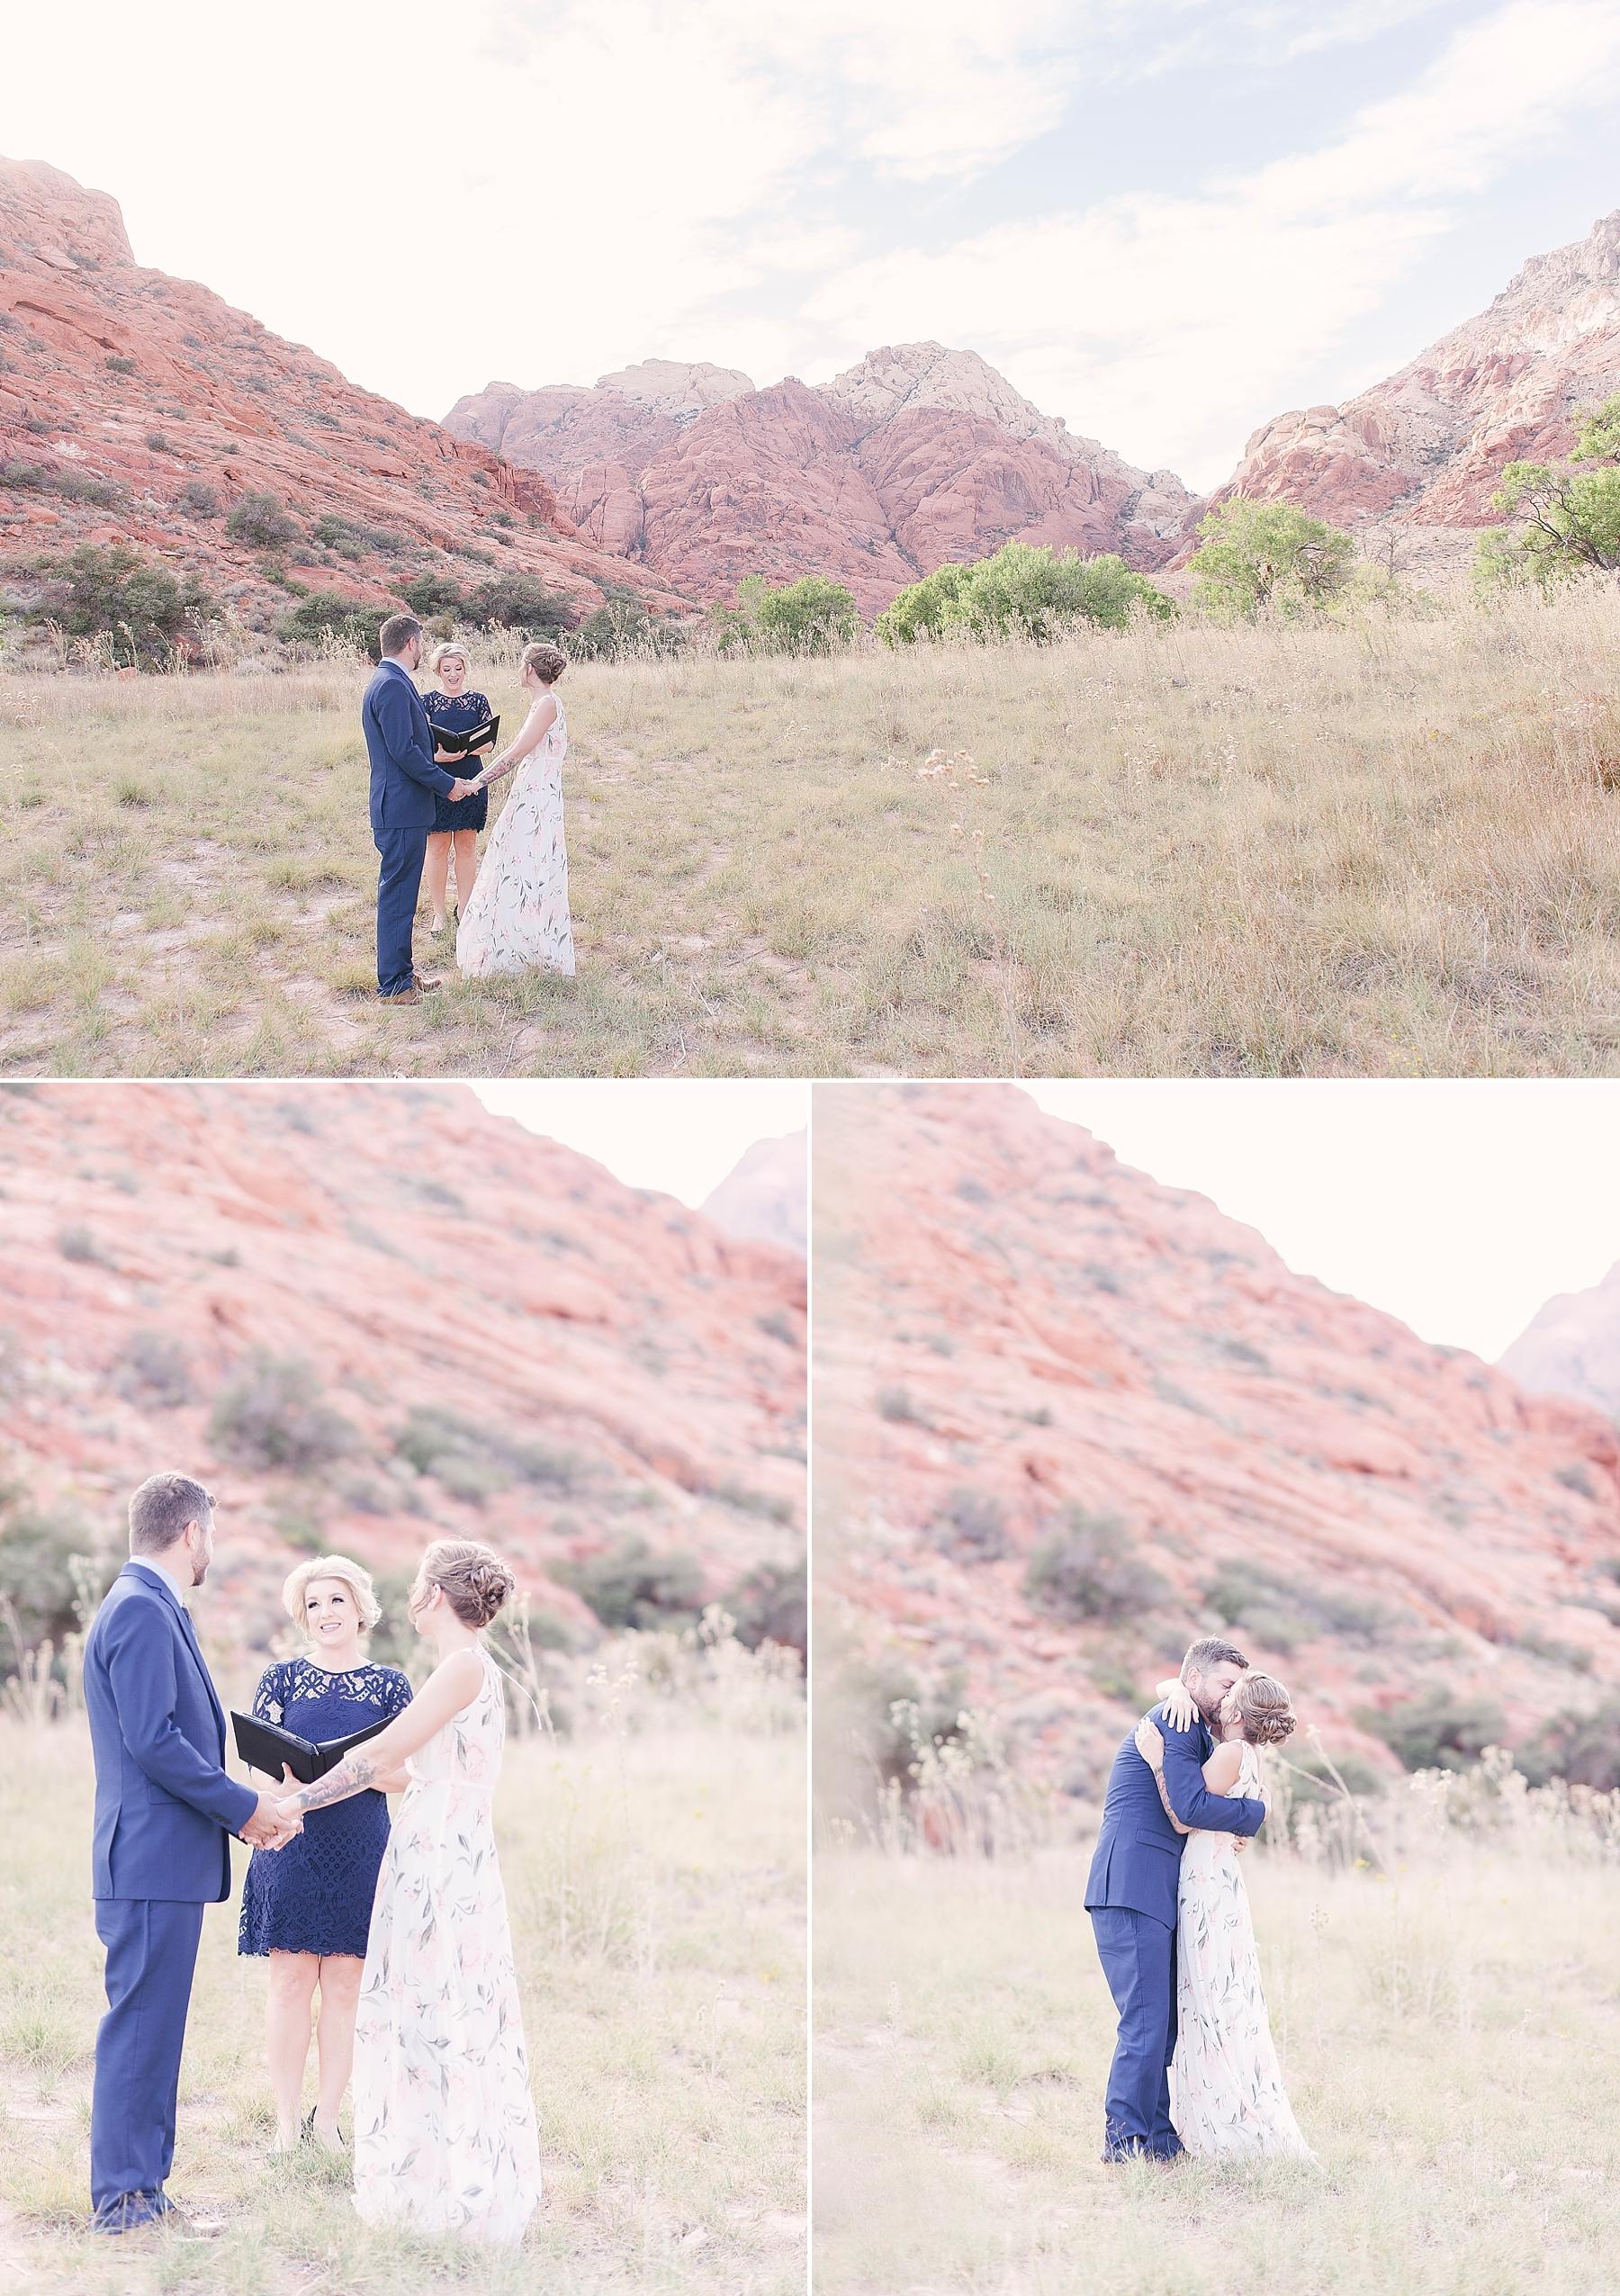 las_vegas_desert_elopement_wedding_photography-1.jpg